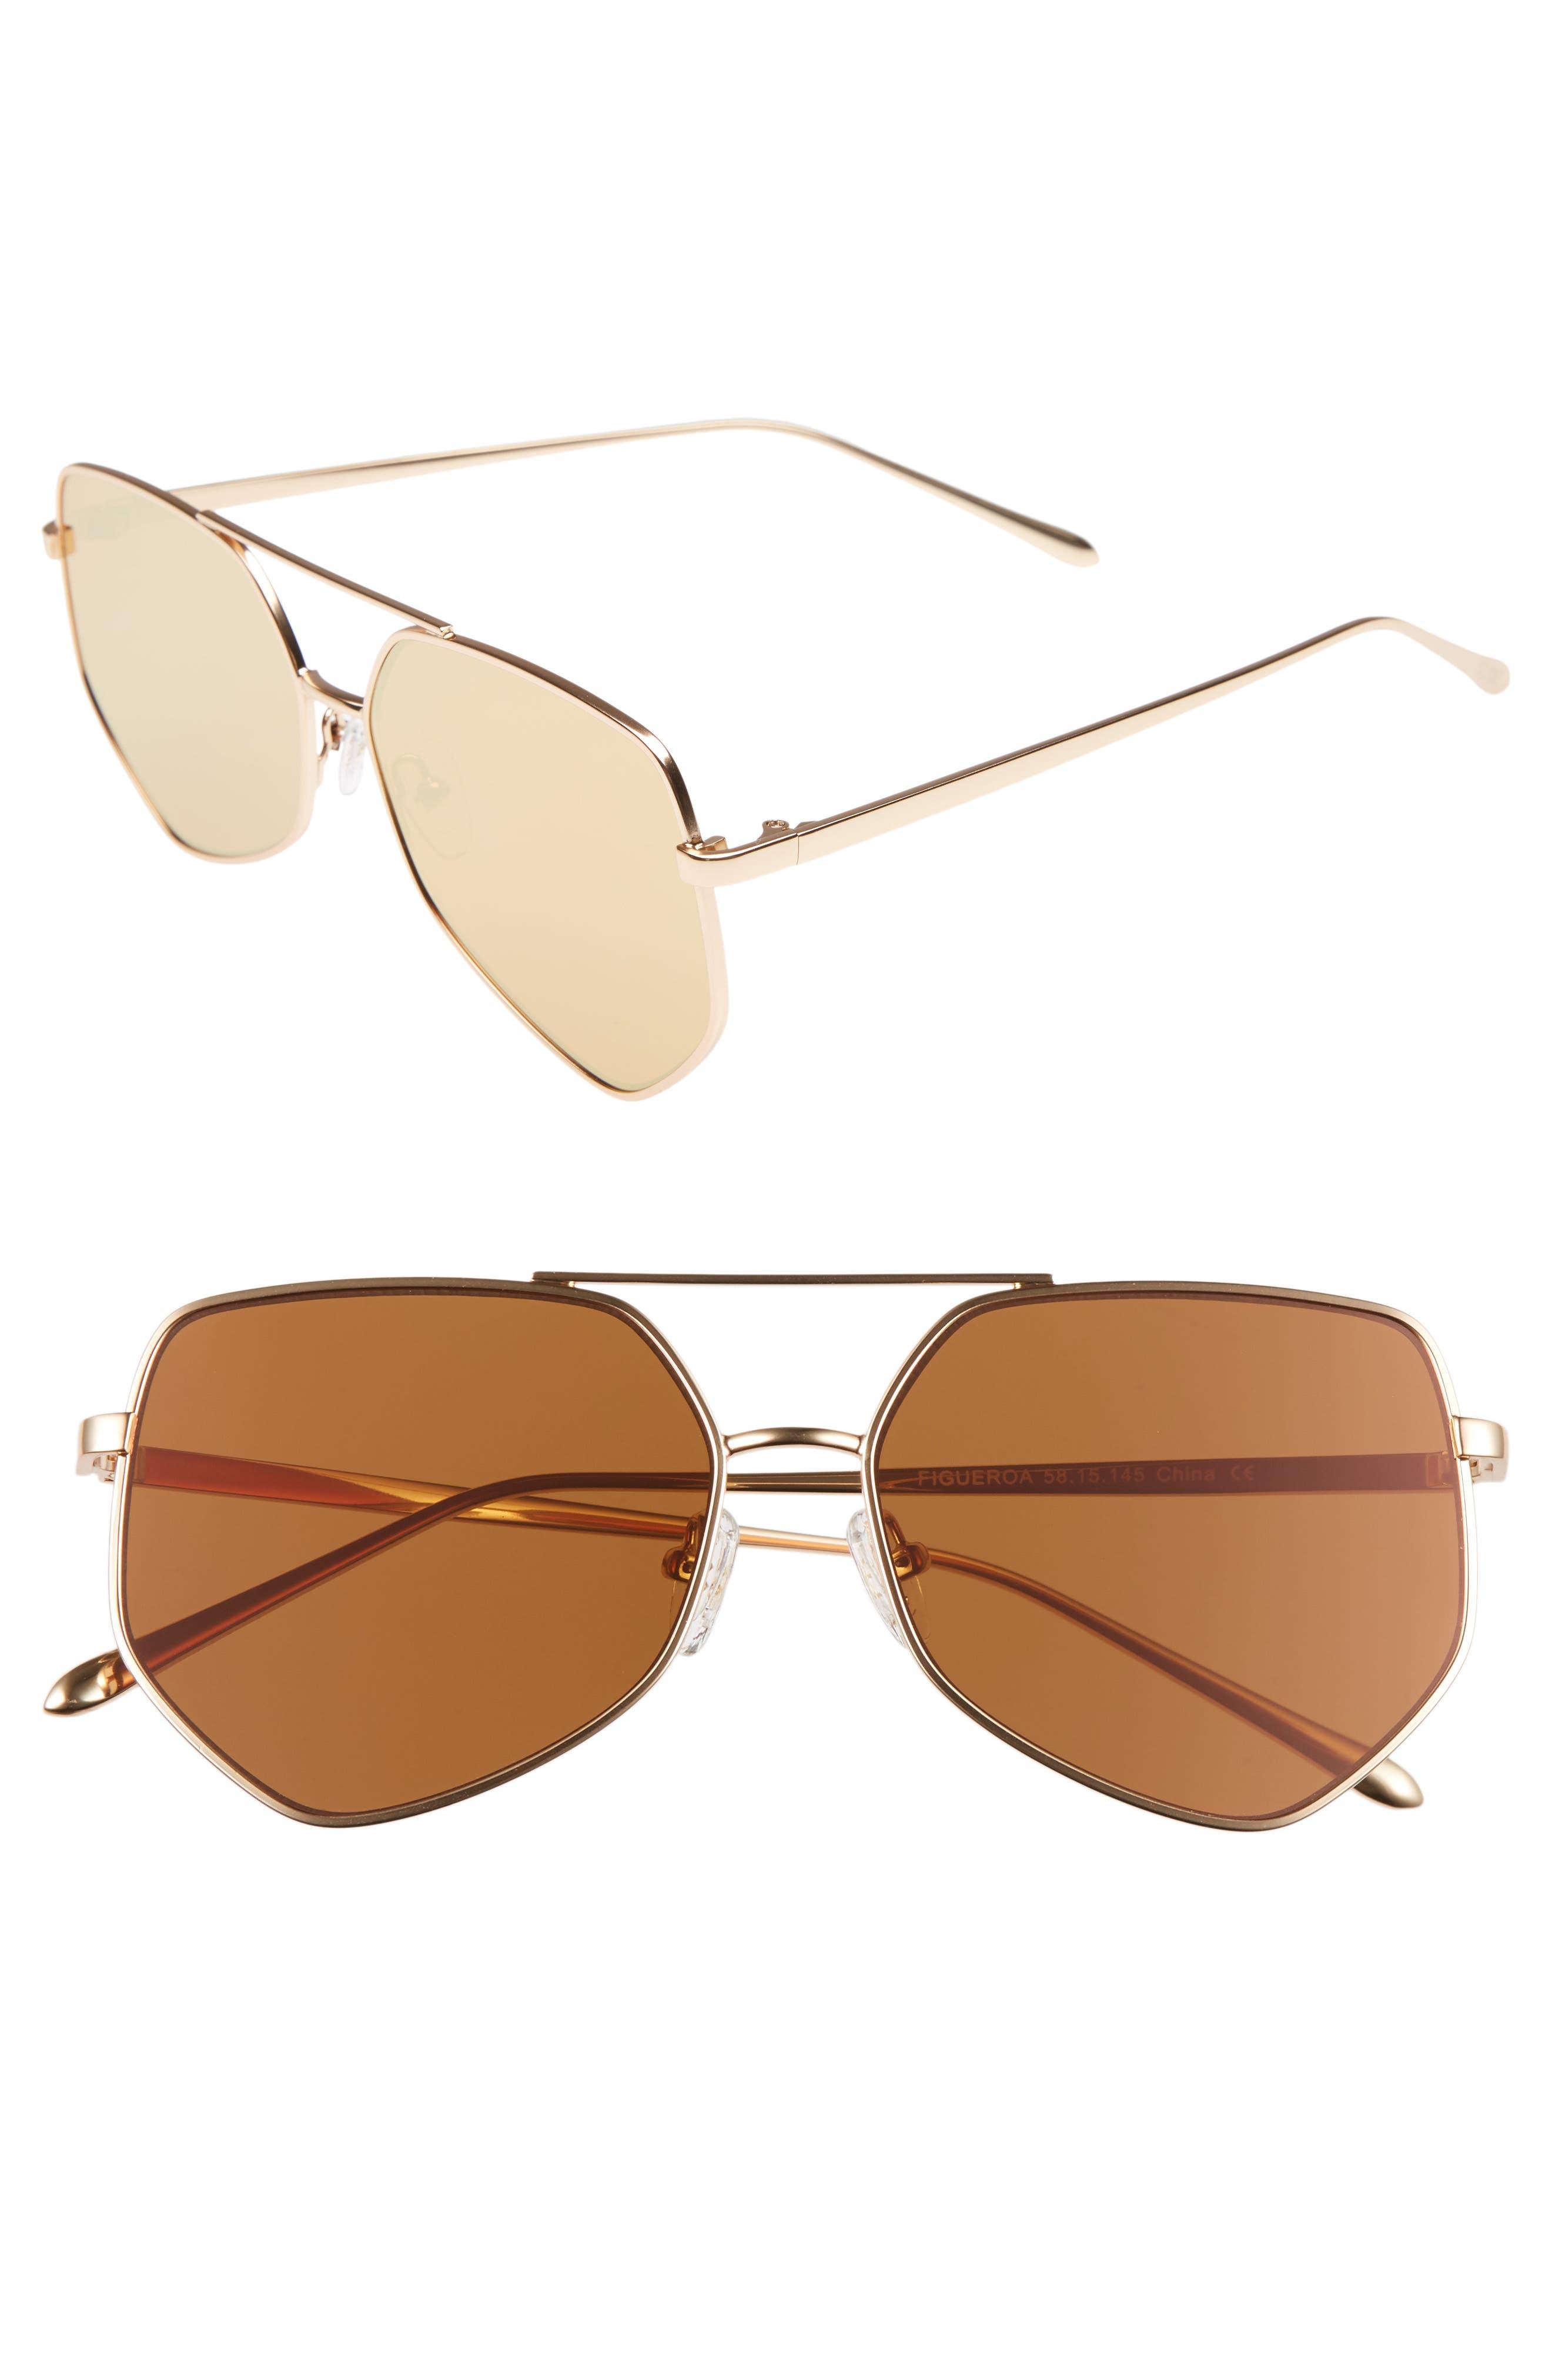 Figueroa 58mm Sunglasses,                         Main,                         color, PALACE GOLD